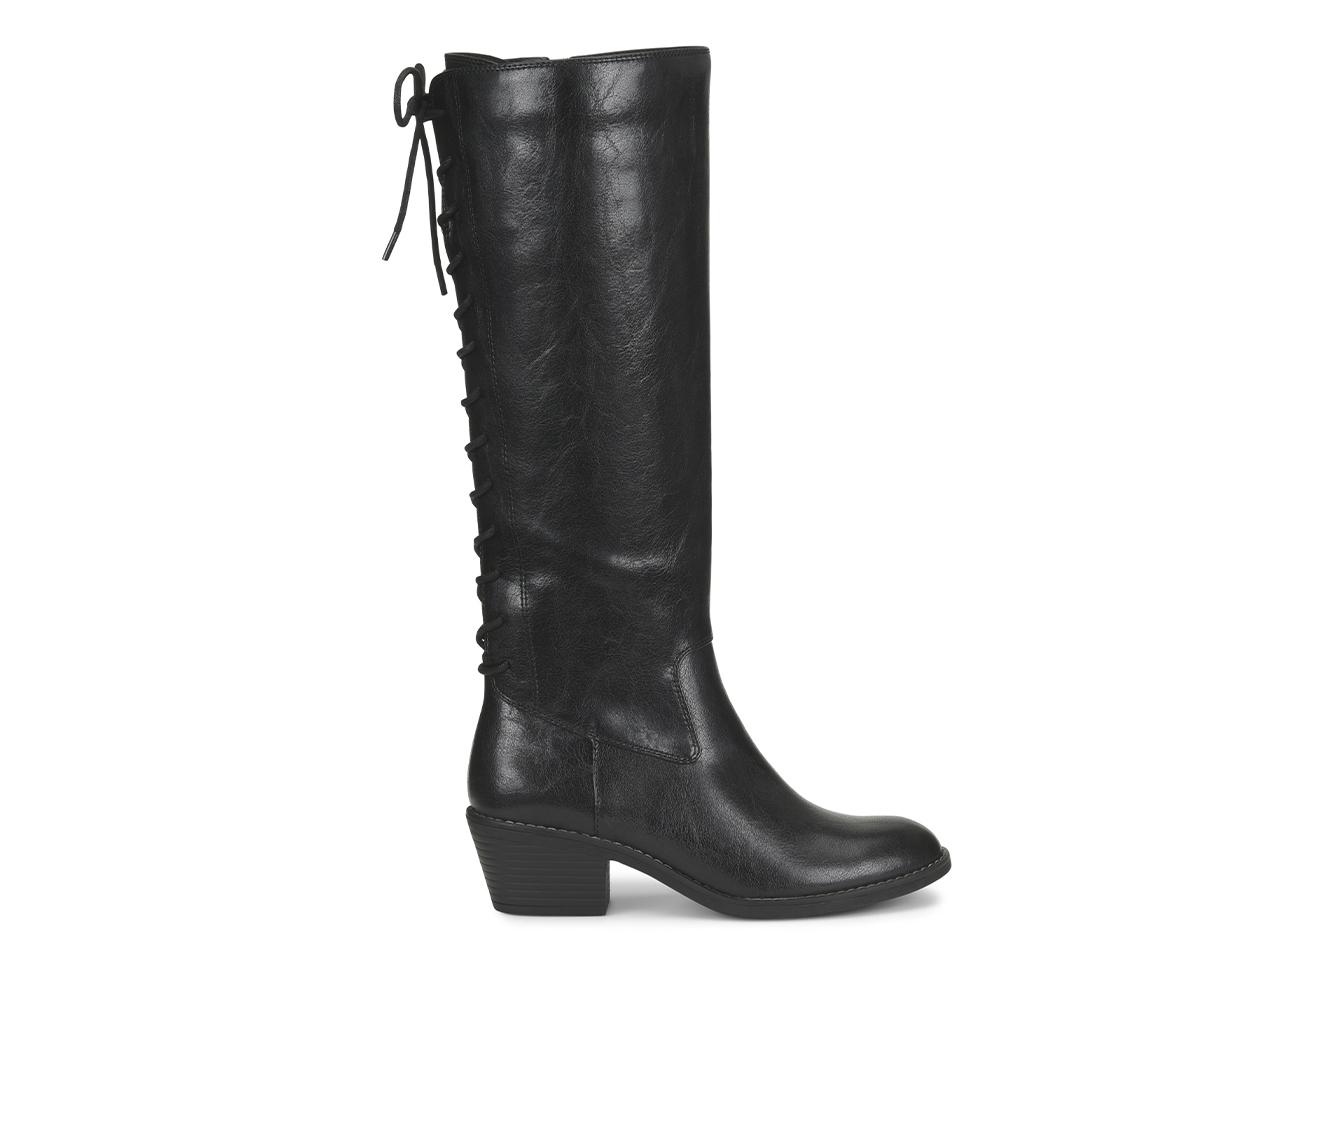 EuroSoft Carlen Women's Boots (Black - Faux Leather)